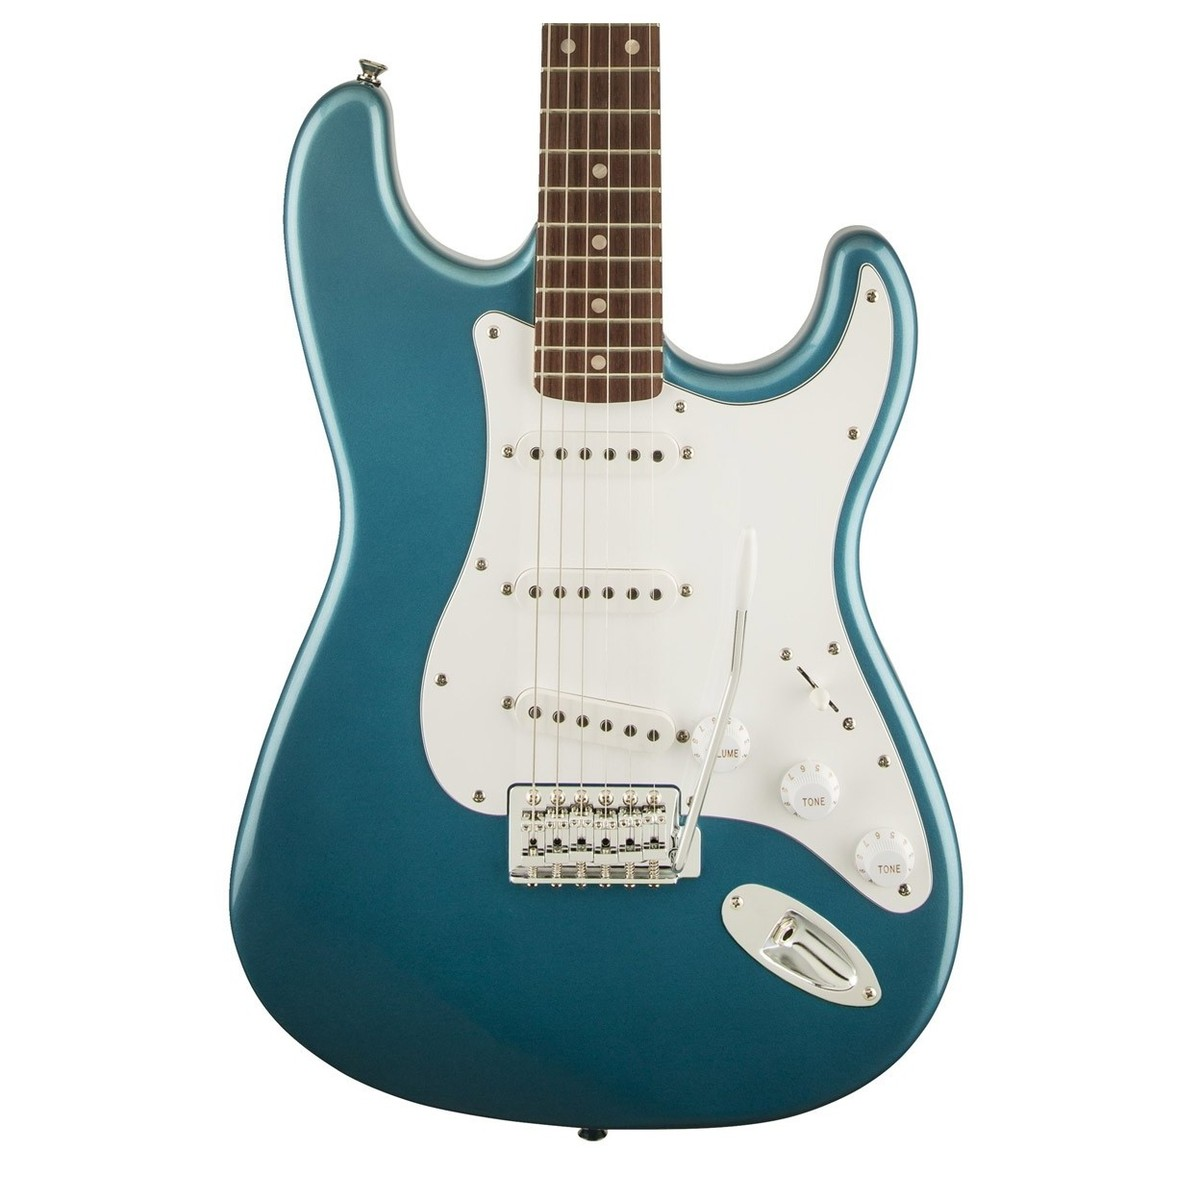 squier by fender affinity stratocaster lake placid blue at gear4music. Black Bedroom Furniture Sets. Home Design Ideas